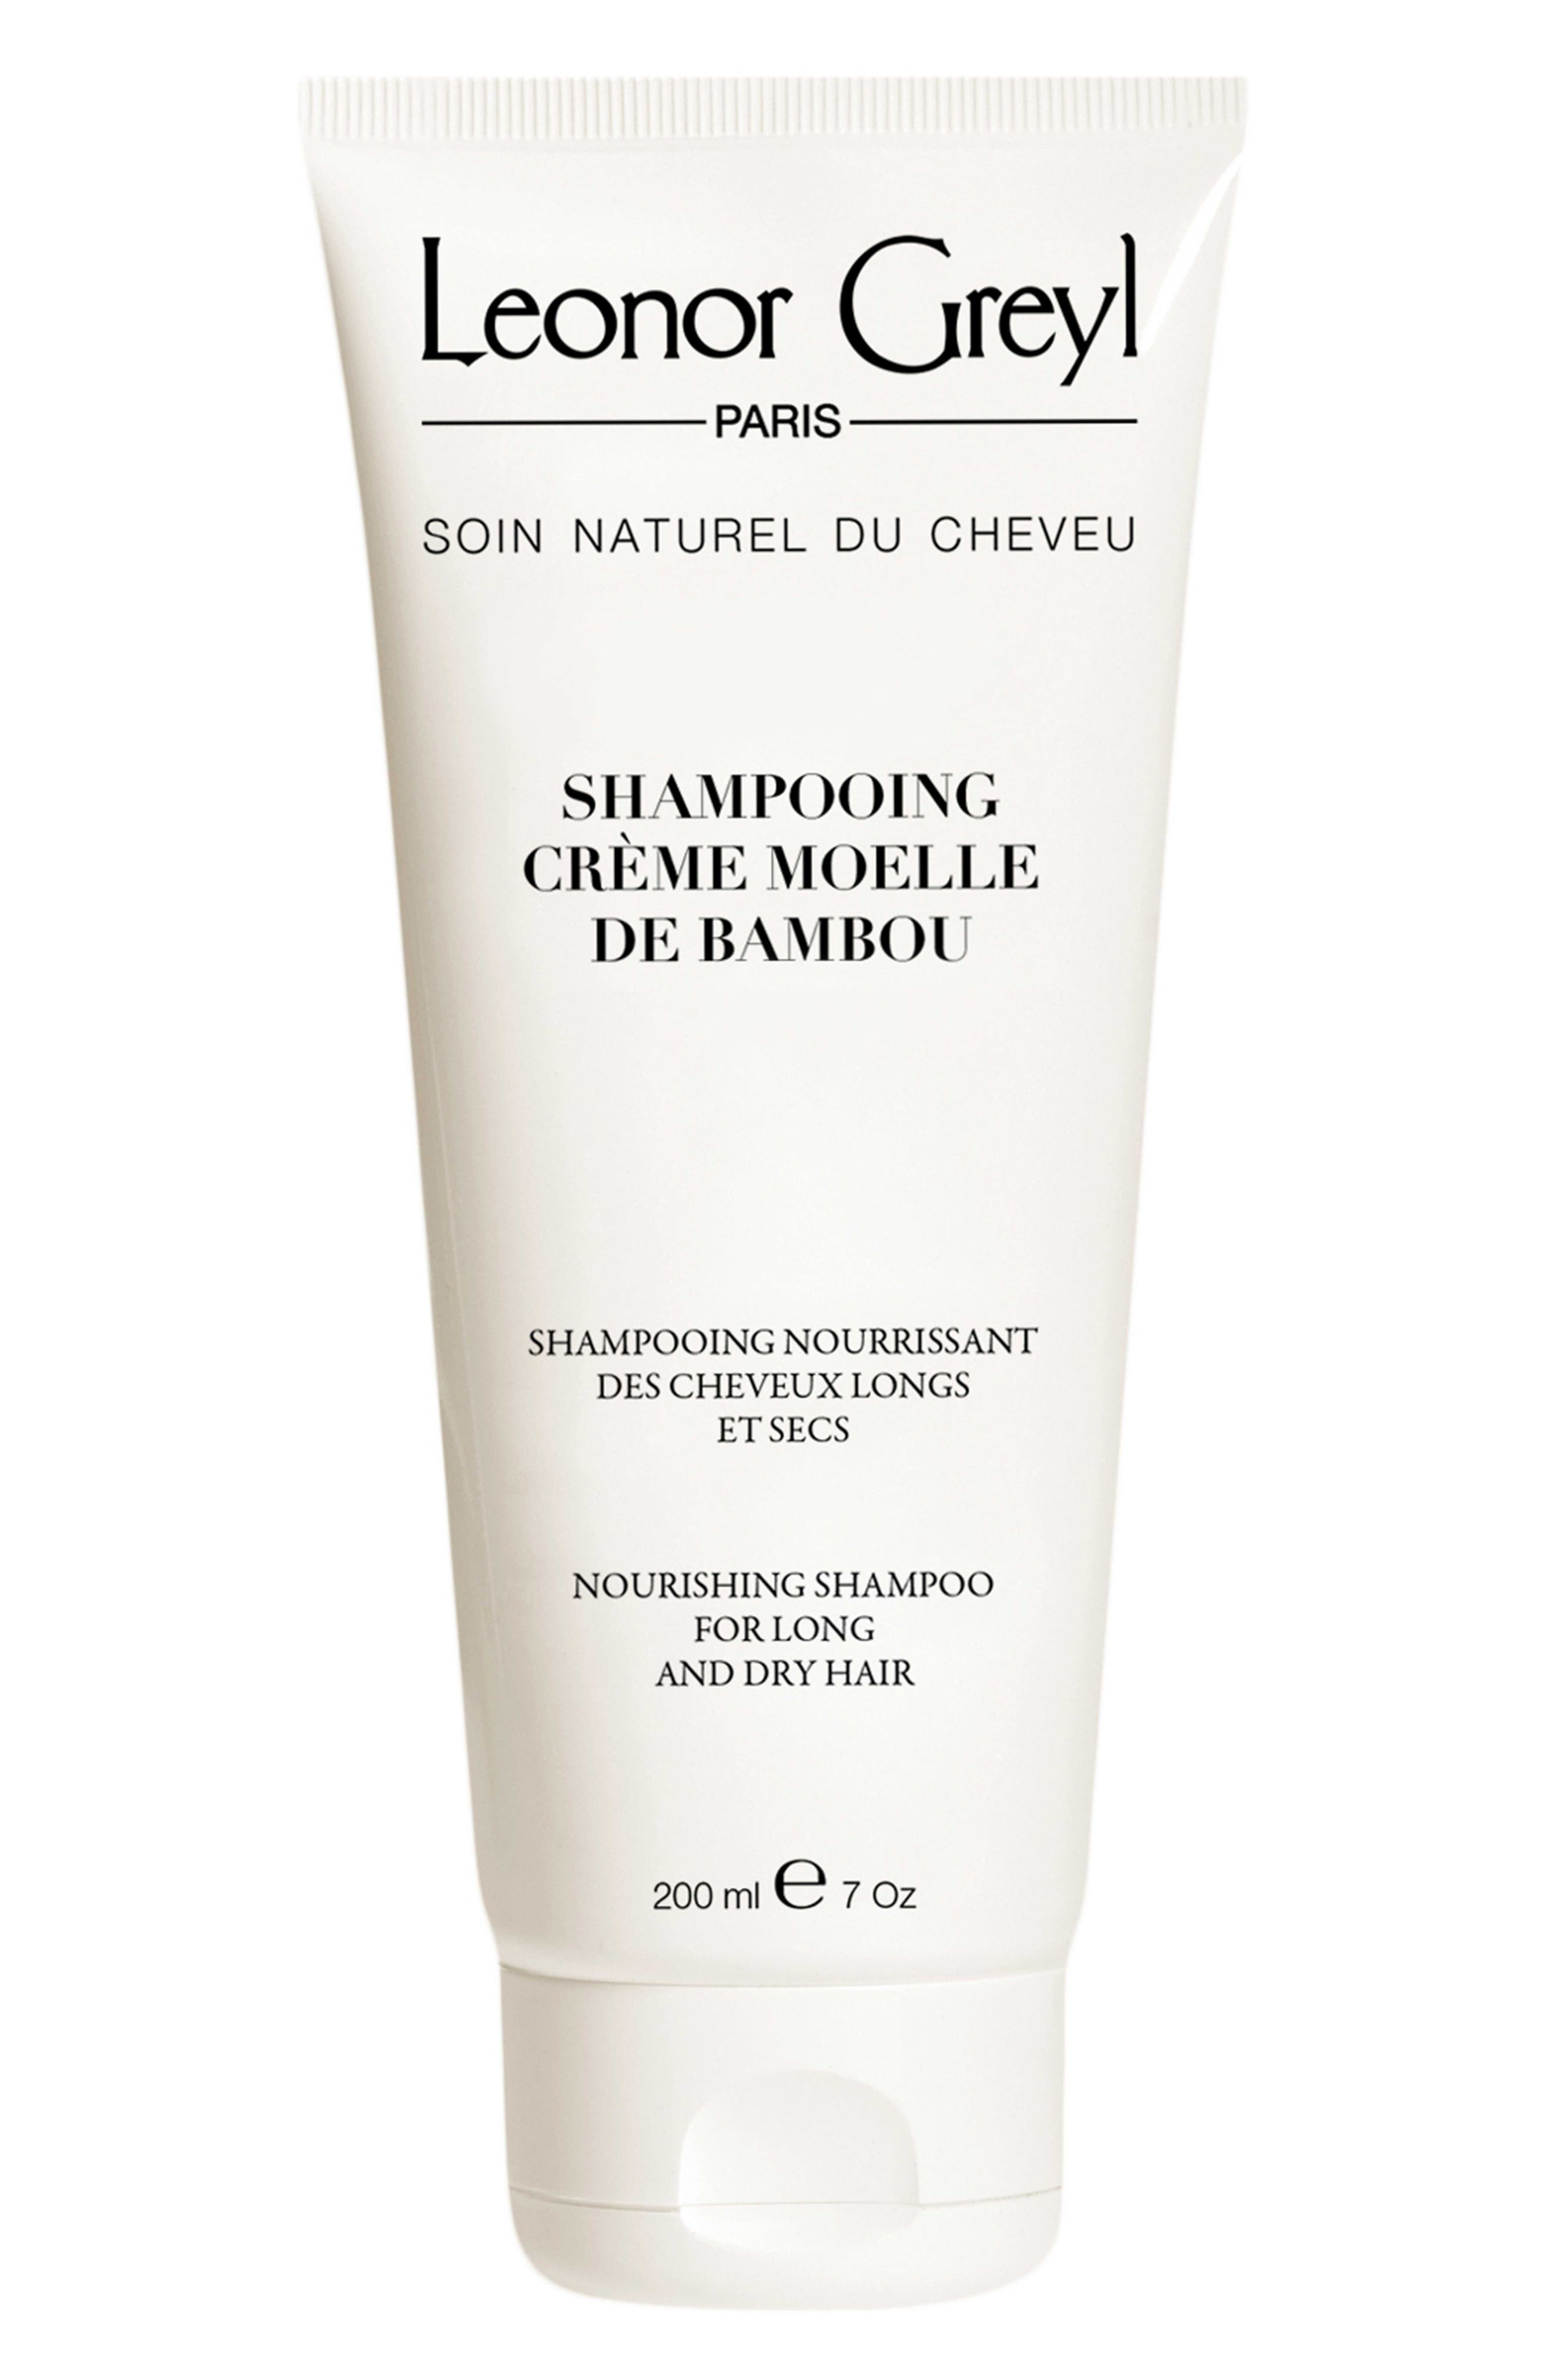 Alternate Image 1 Selected - Leonor Greyl PARIS 'Crème Moelle de Bambou' Nourishing Shampoo